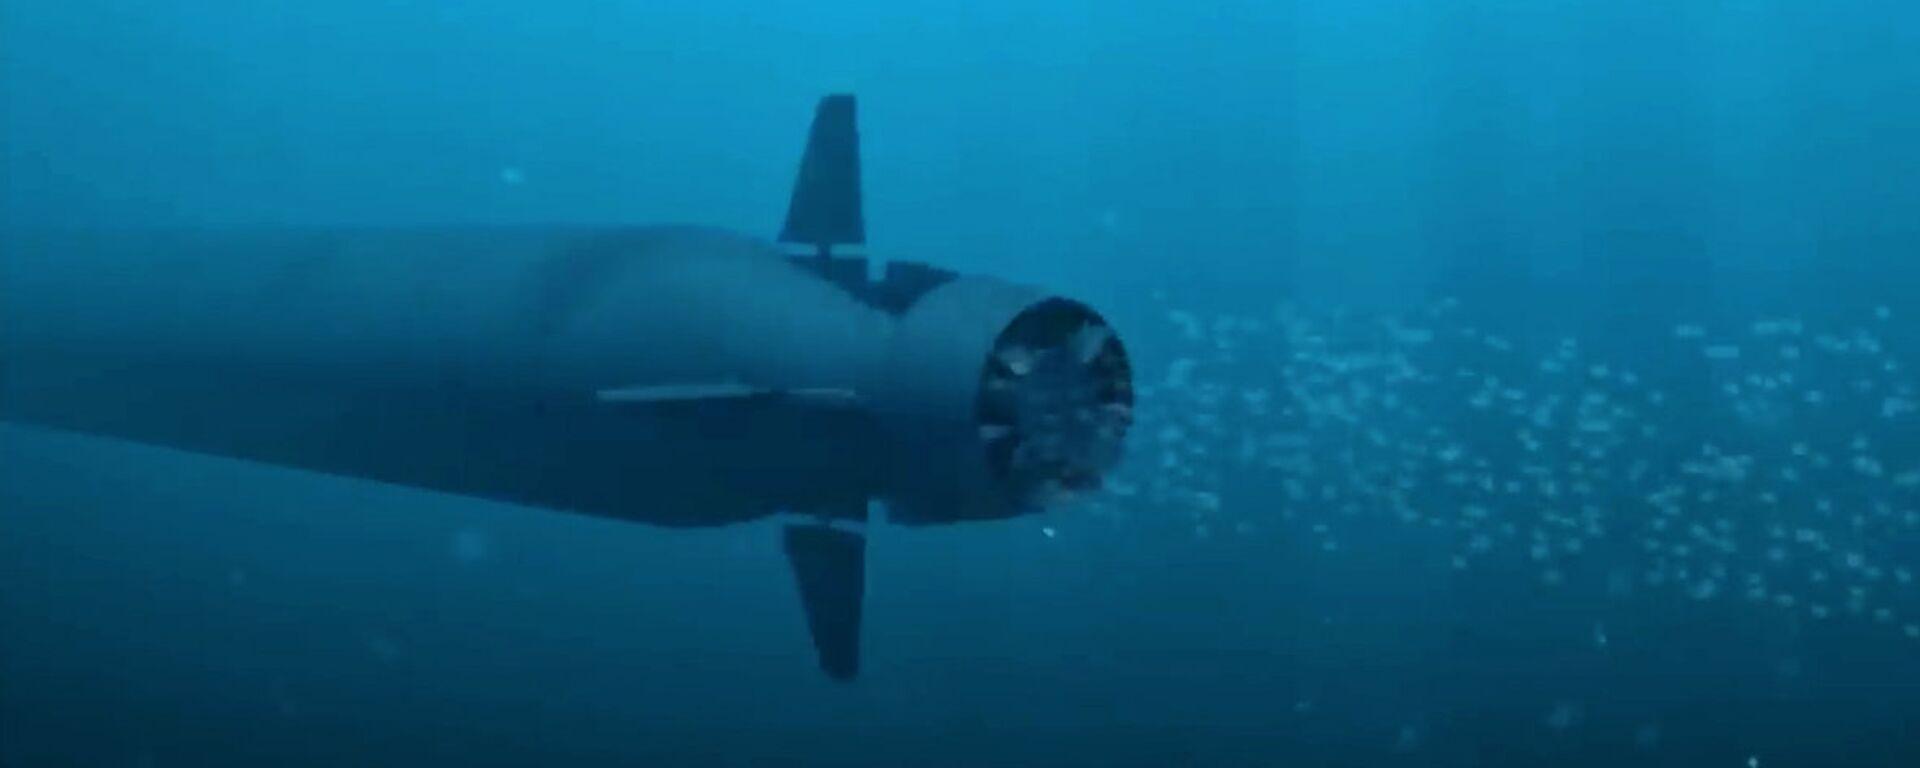 Poseidon, dron submarino ruso - Sputnik Mundo, 1920, 02.05.2021